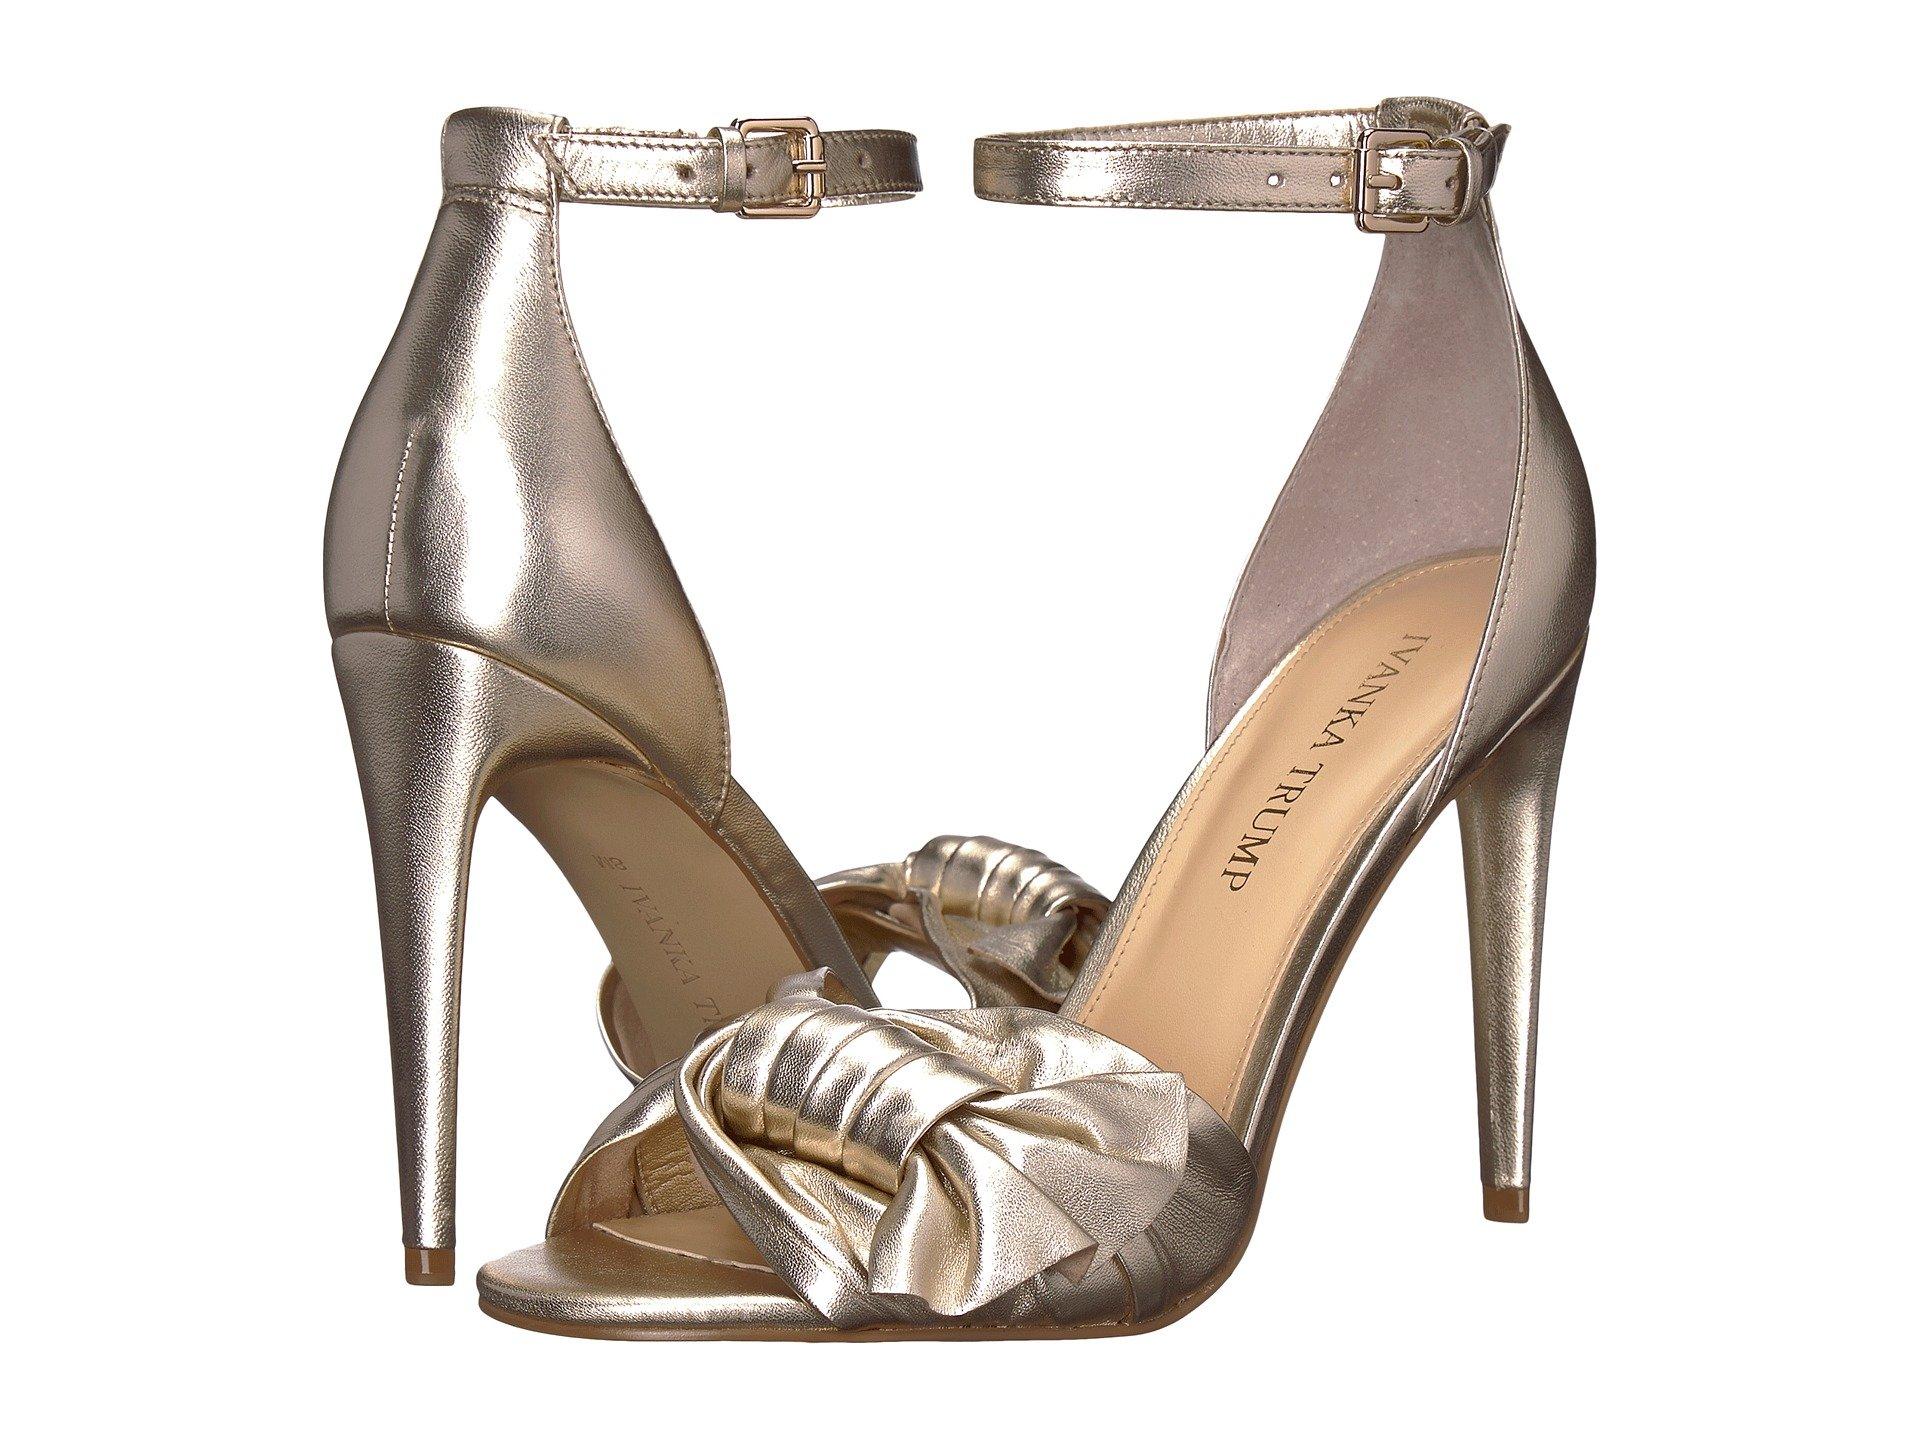 Ivanka Trump Shoes Women